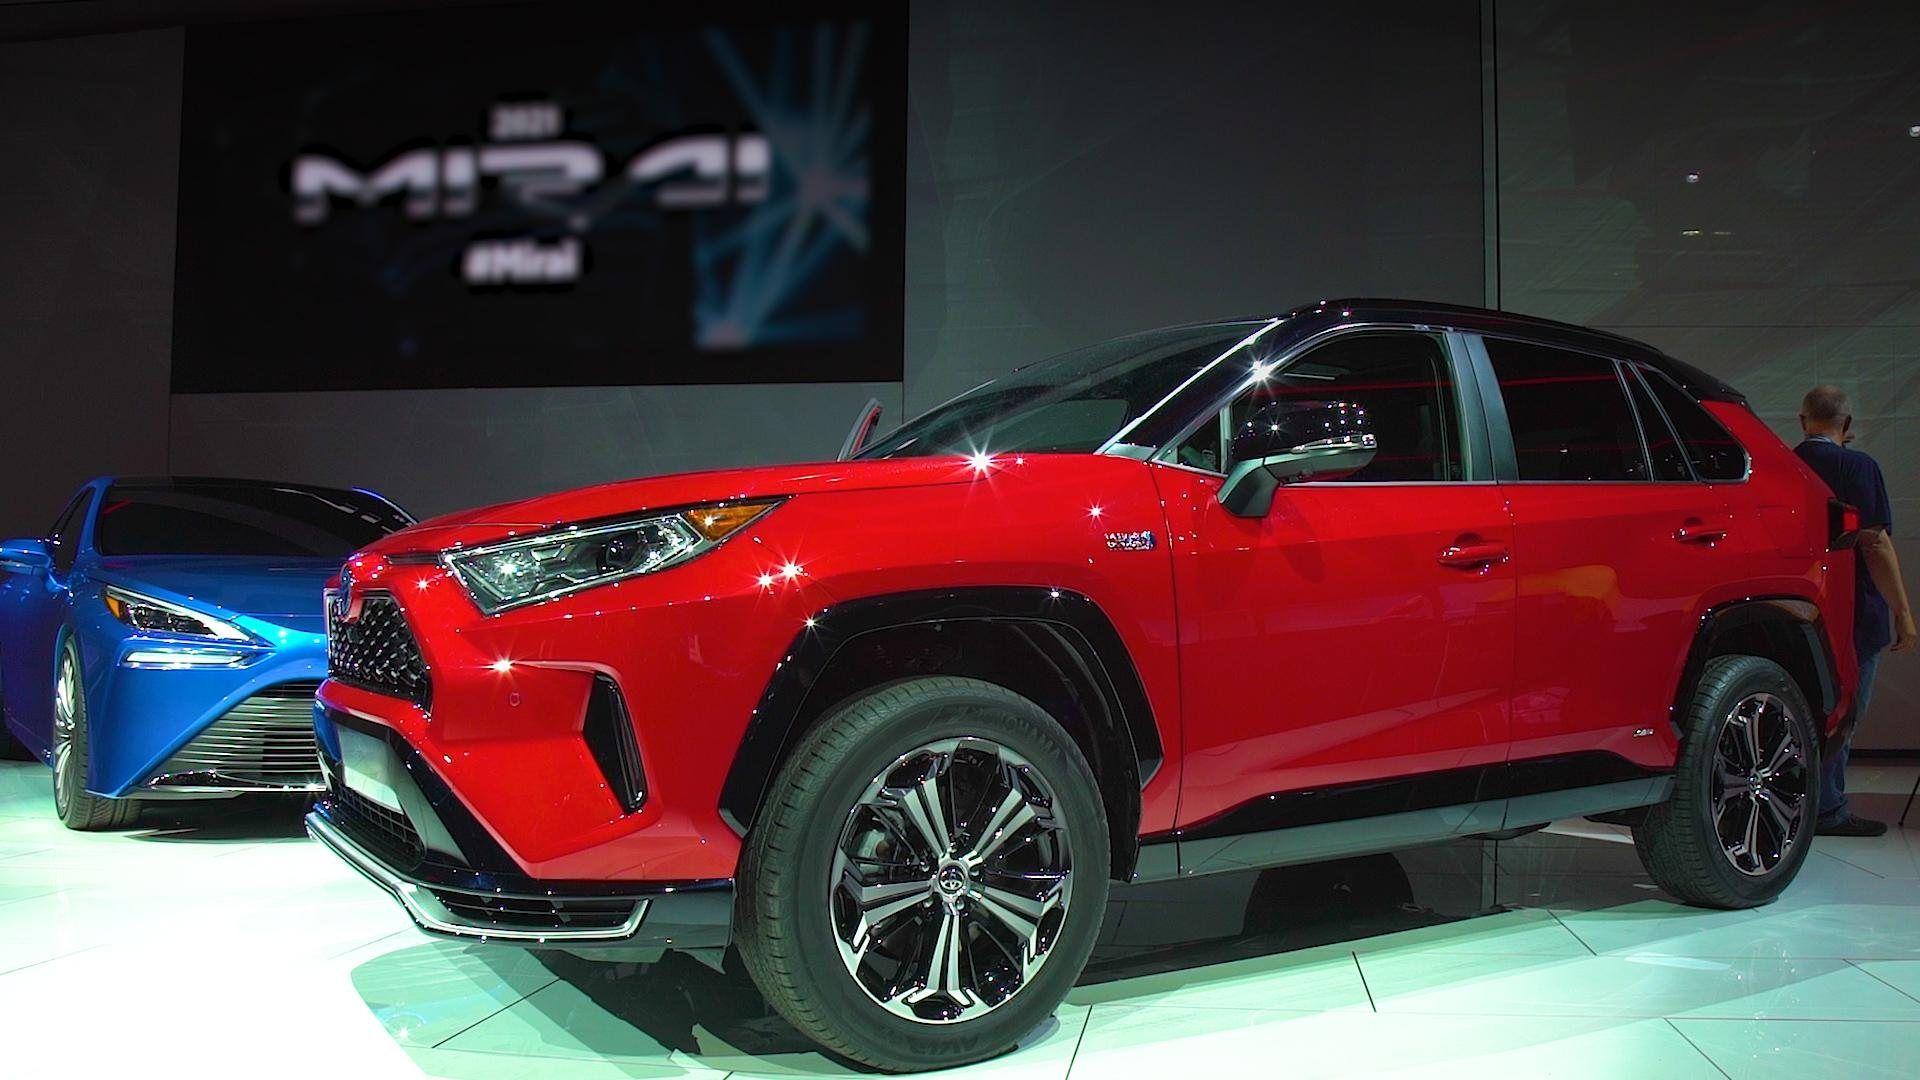 2021 Mitsubishi Outlander Sport Configurations in 2020